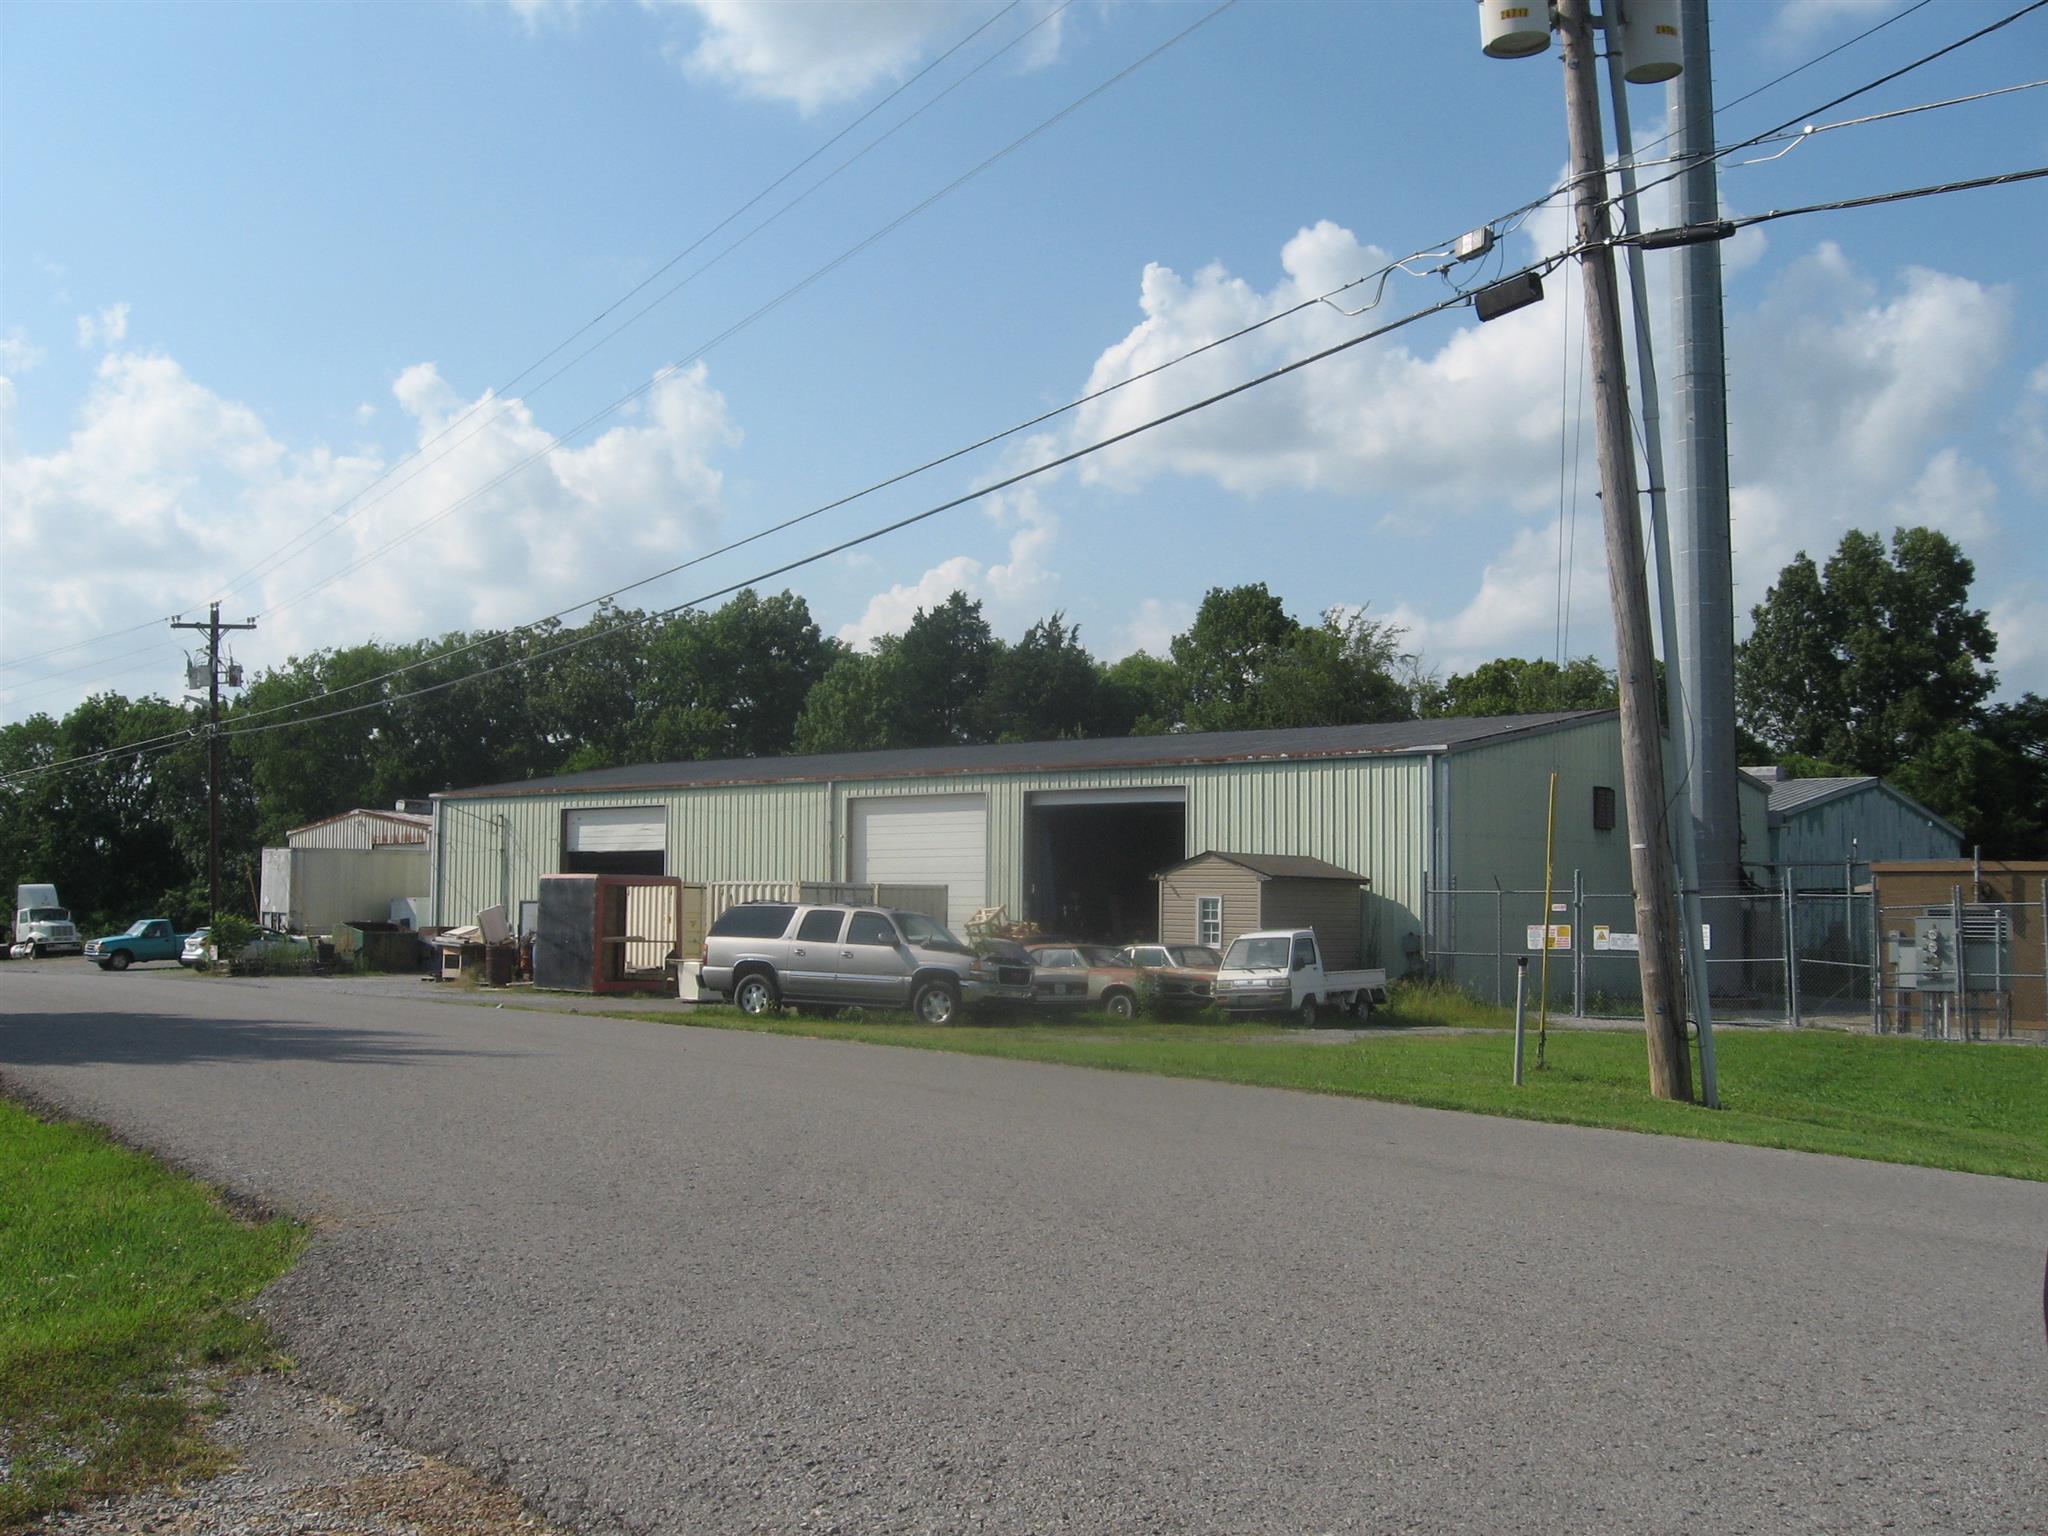 235 Industrial Drive, Mount Juliet, TN 37122 - Mount Juliet, TN real estate listing